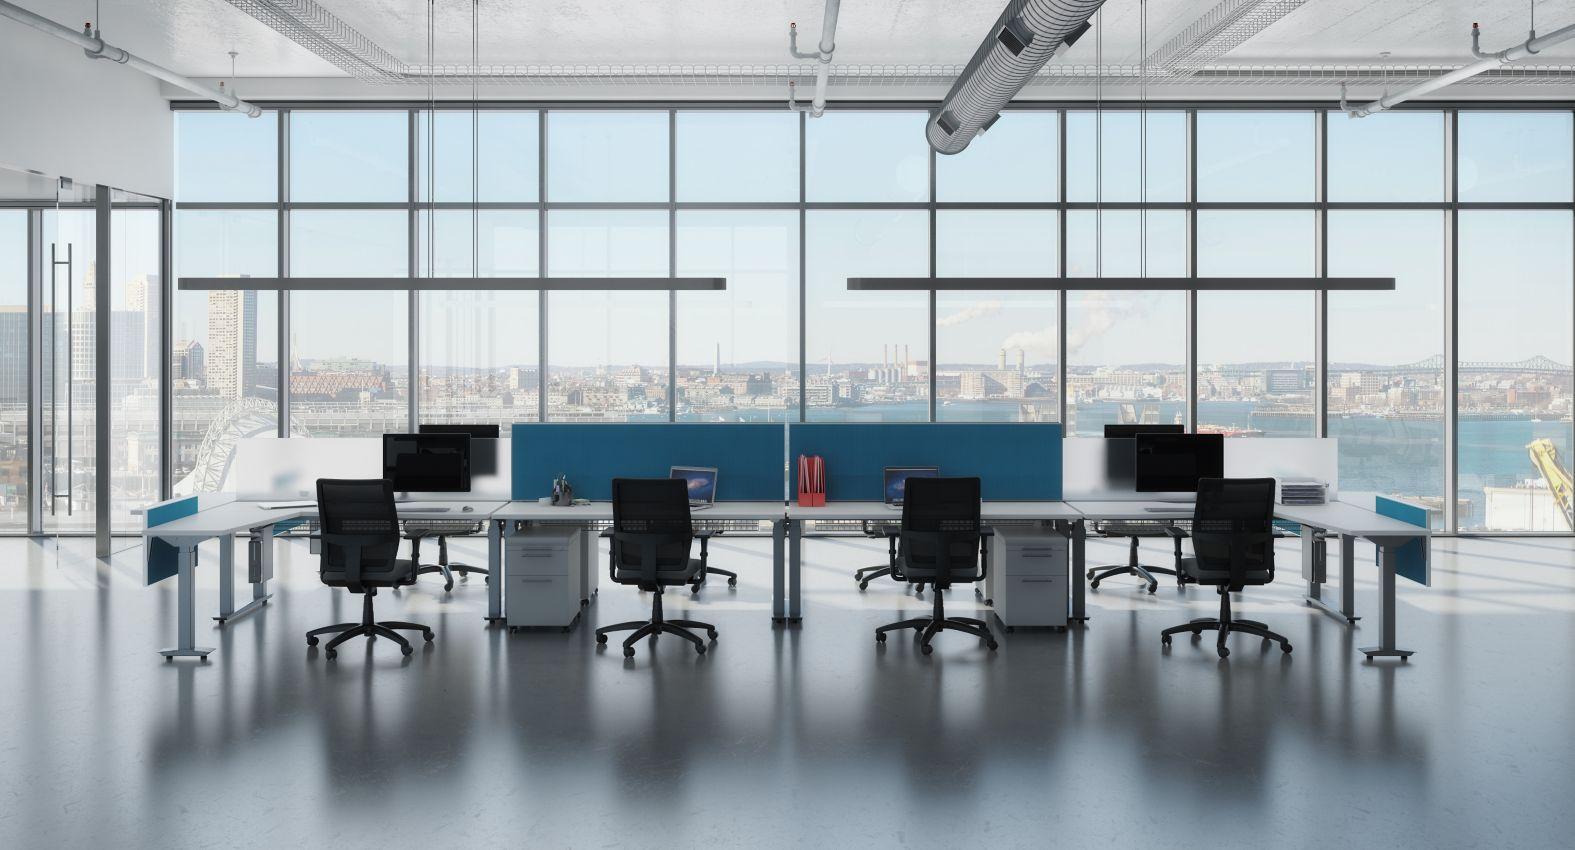 AIS Aloft Height Adjustable Sit to Stand Desks